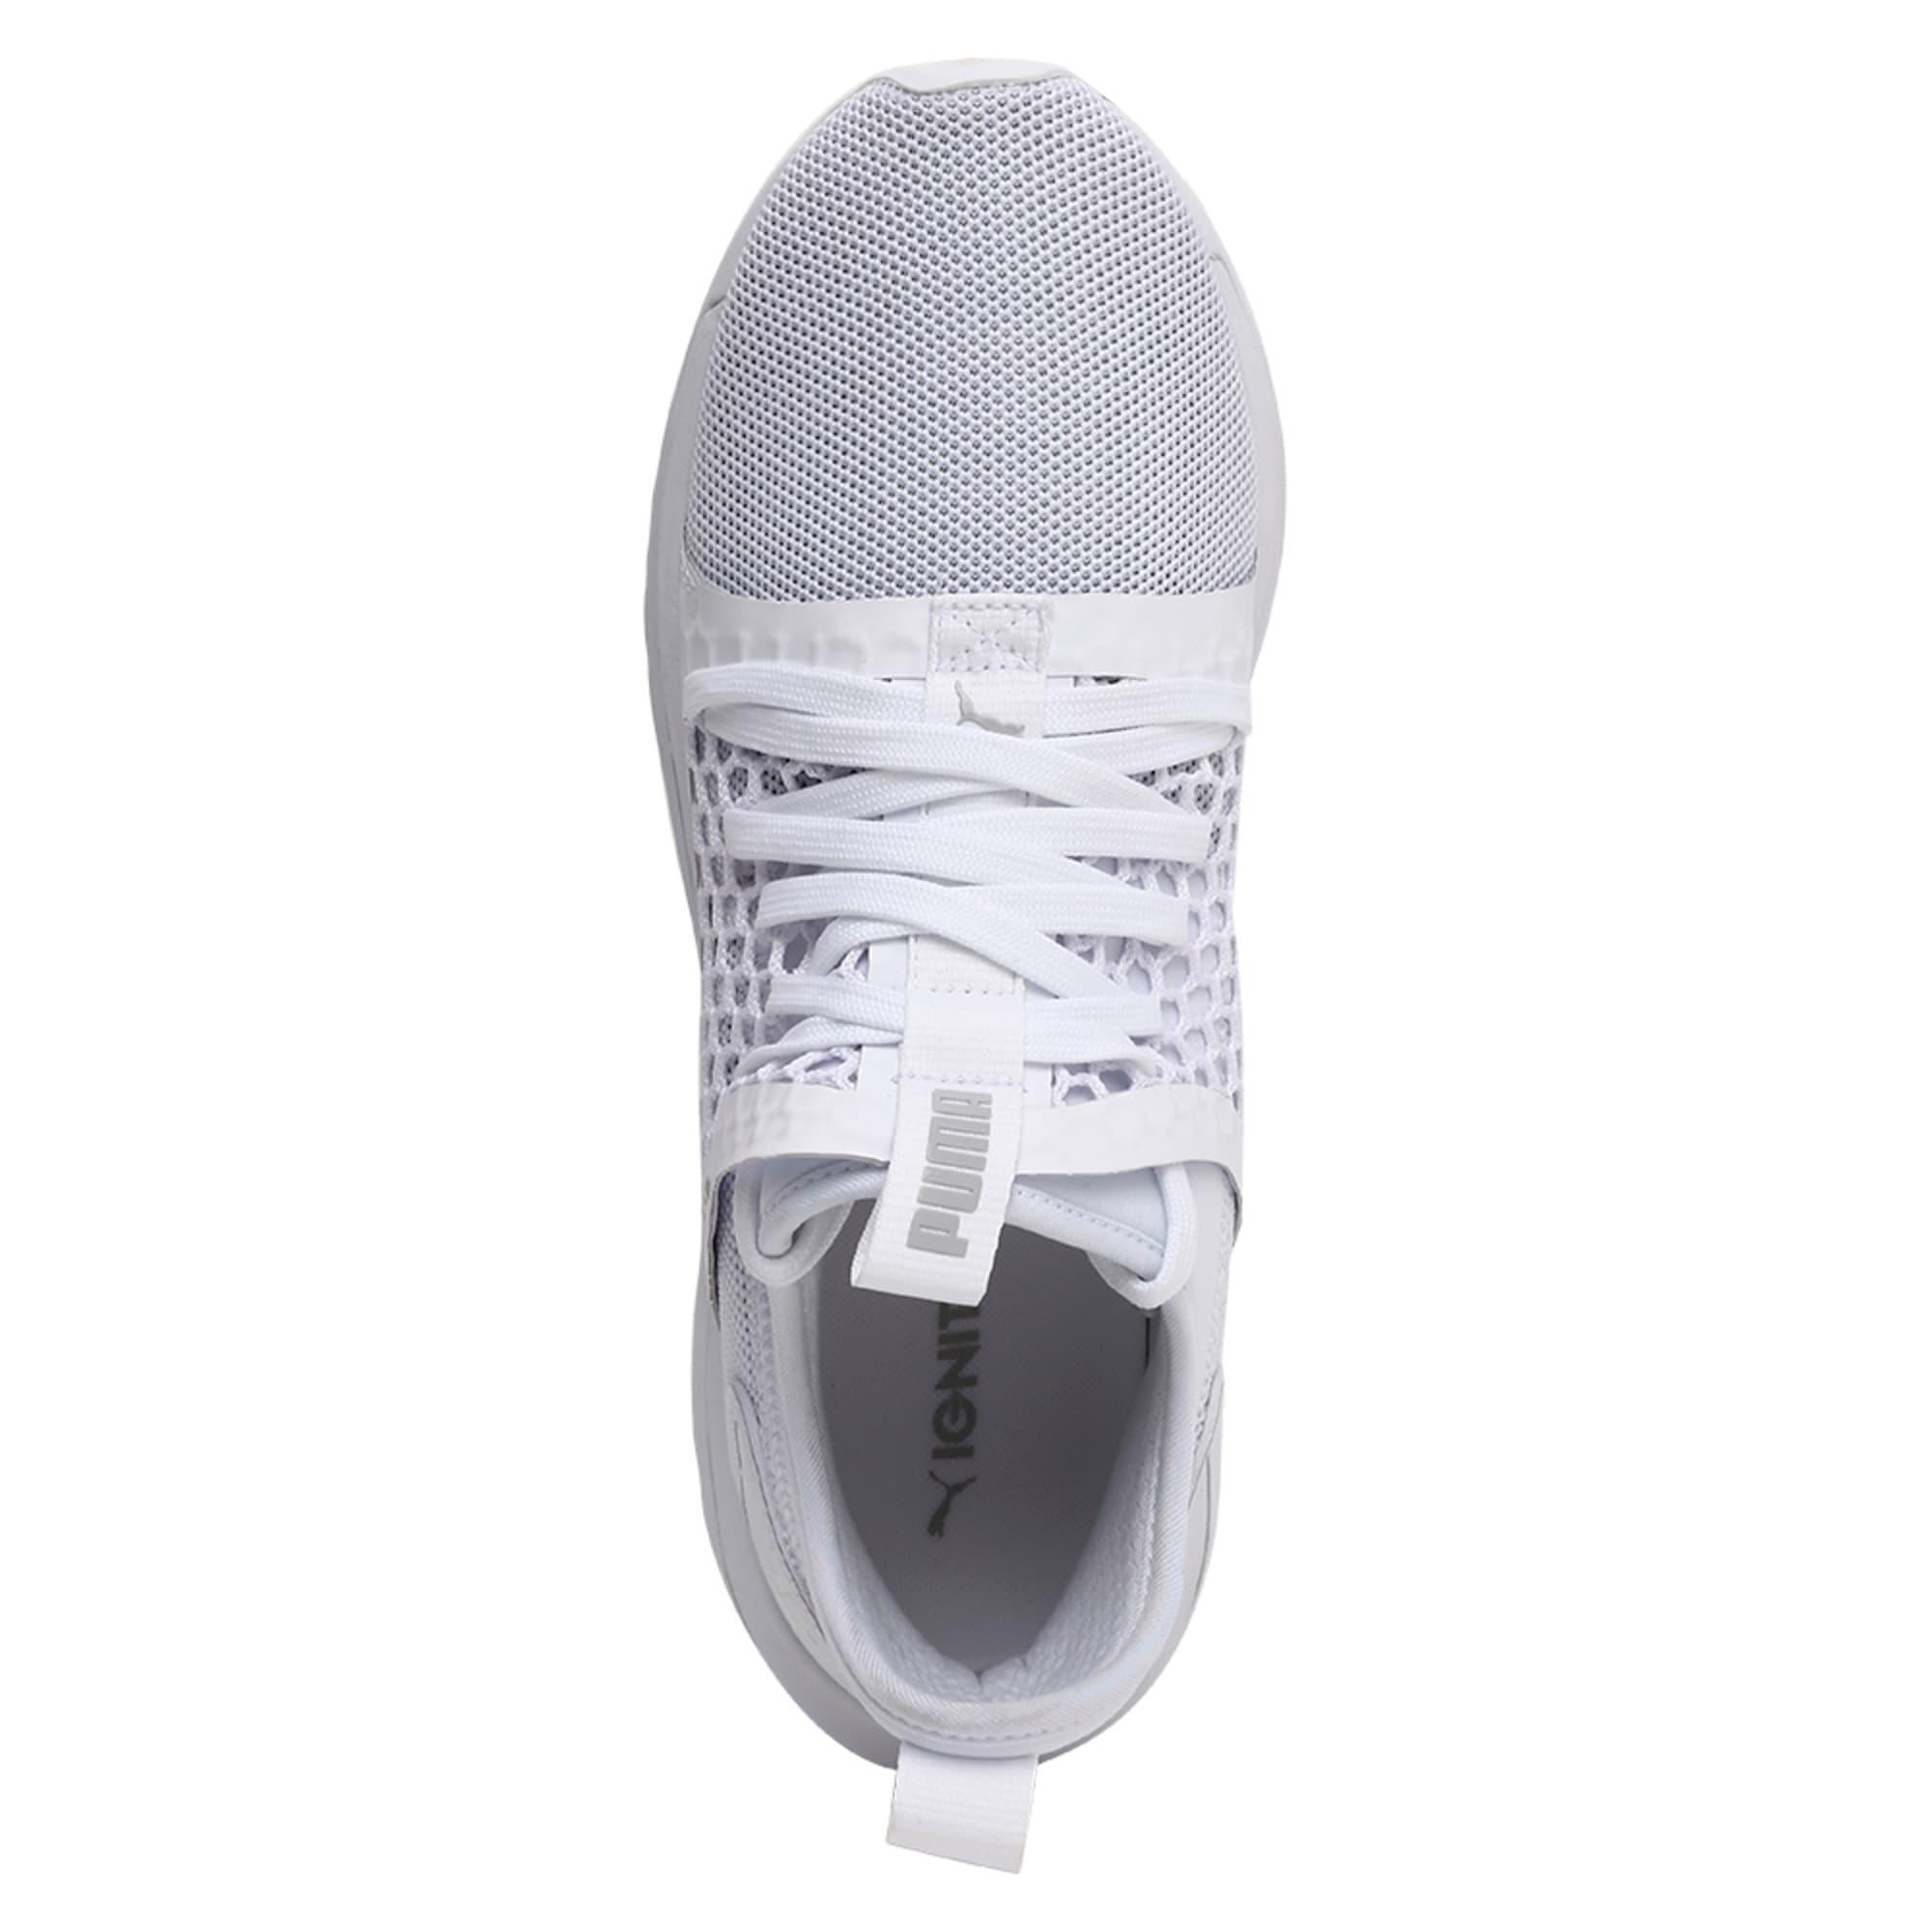 Thumbnail 4 of IGNITE Limitless SR NETFIT Men's Trainer Shoes, Puma White-Puma White, medium-IND